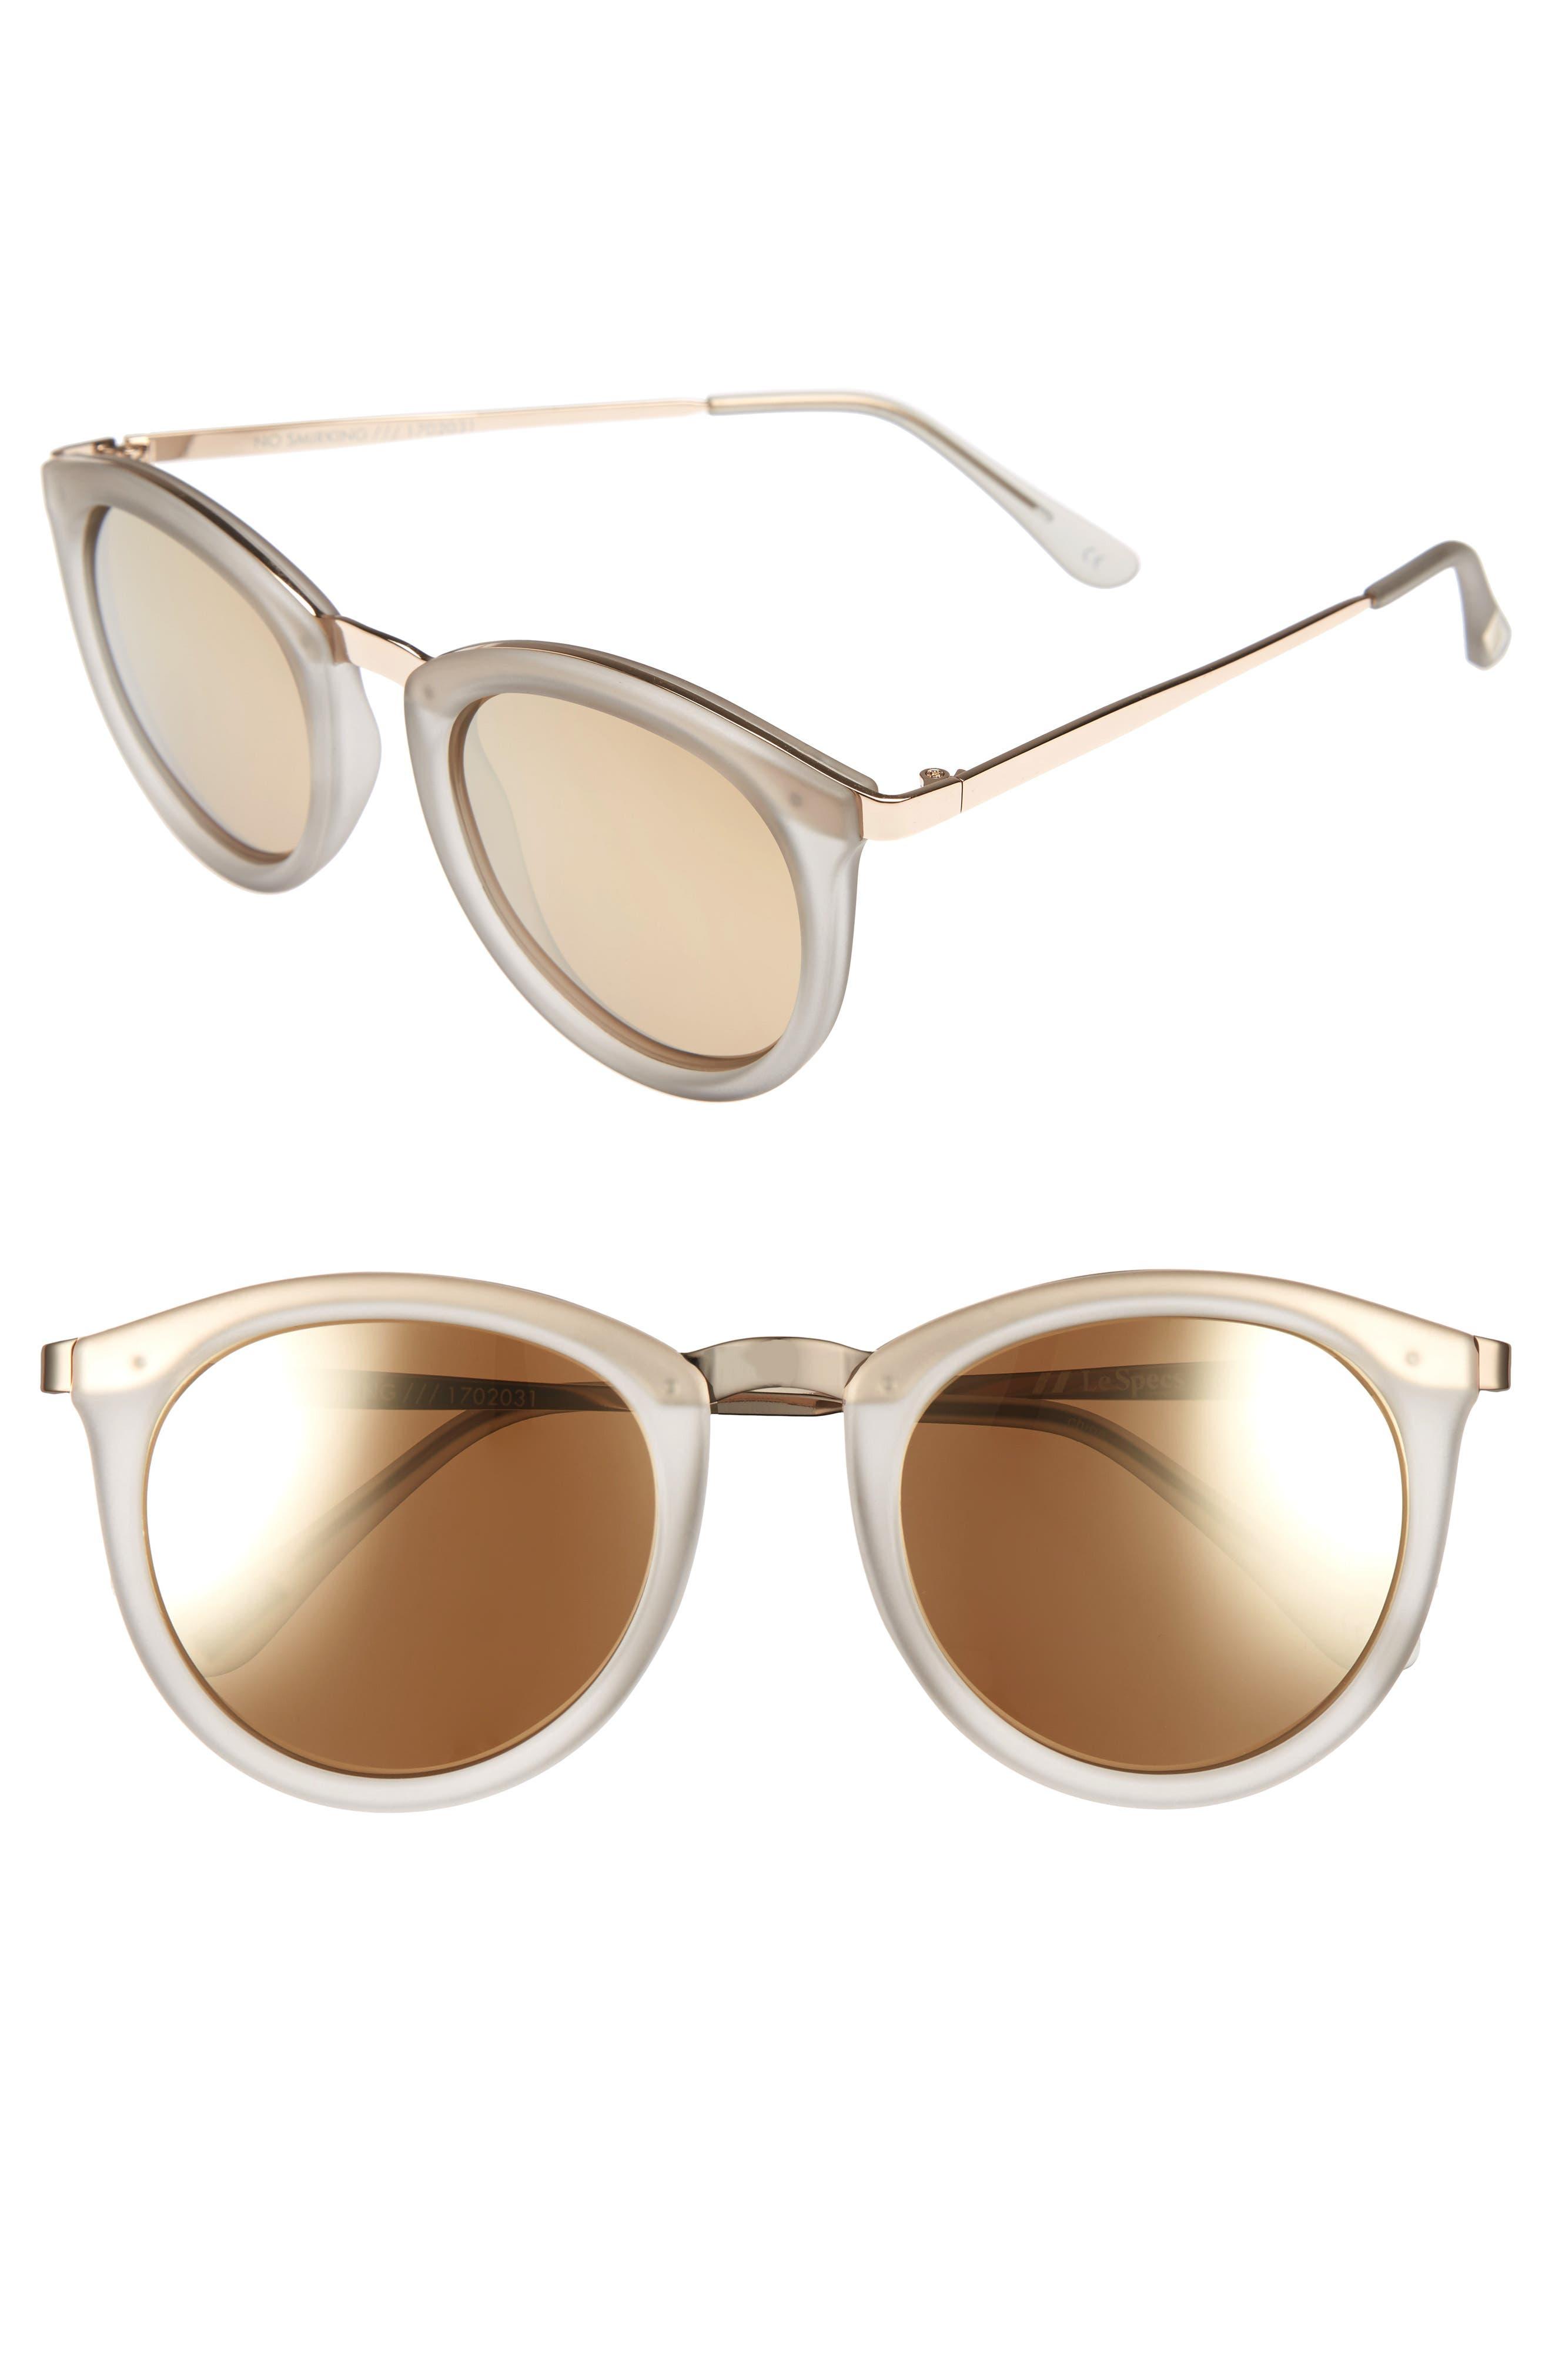 Le Specs No Smirking 50Mm Polarized Sunglasses -